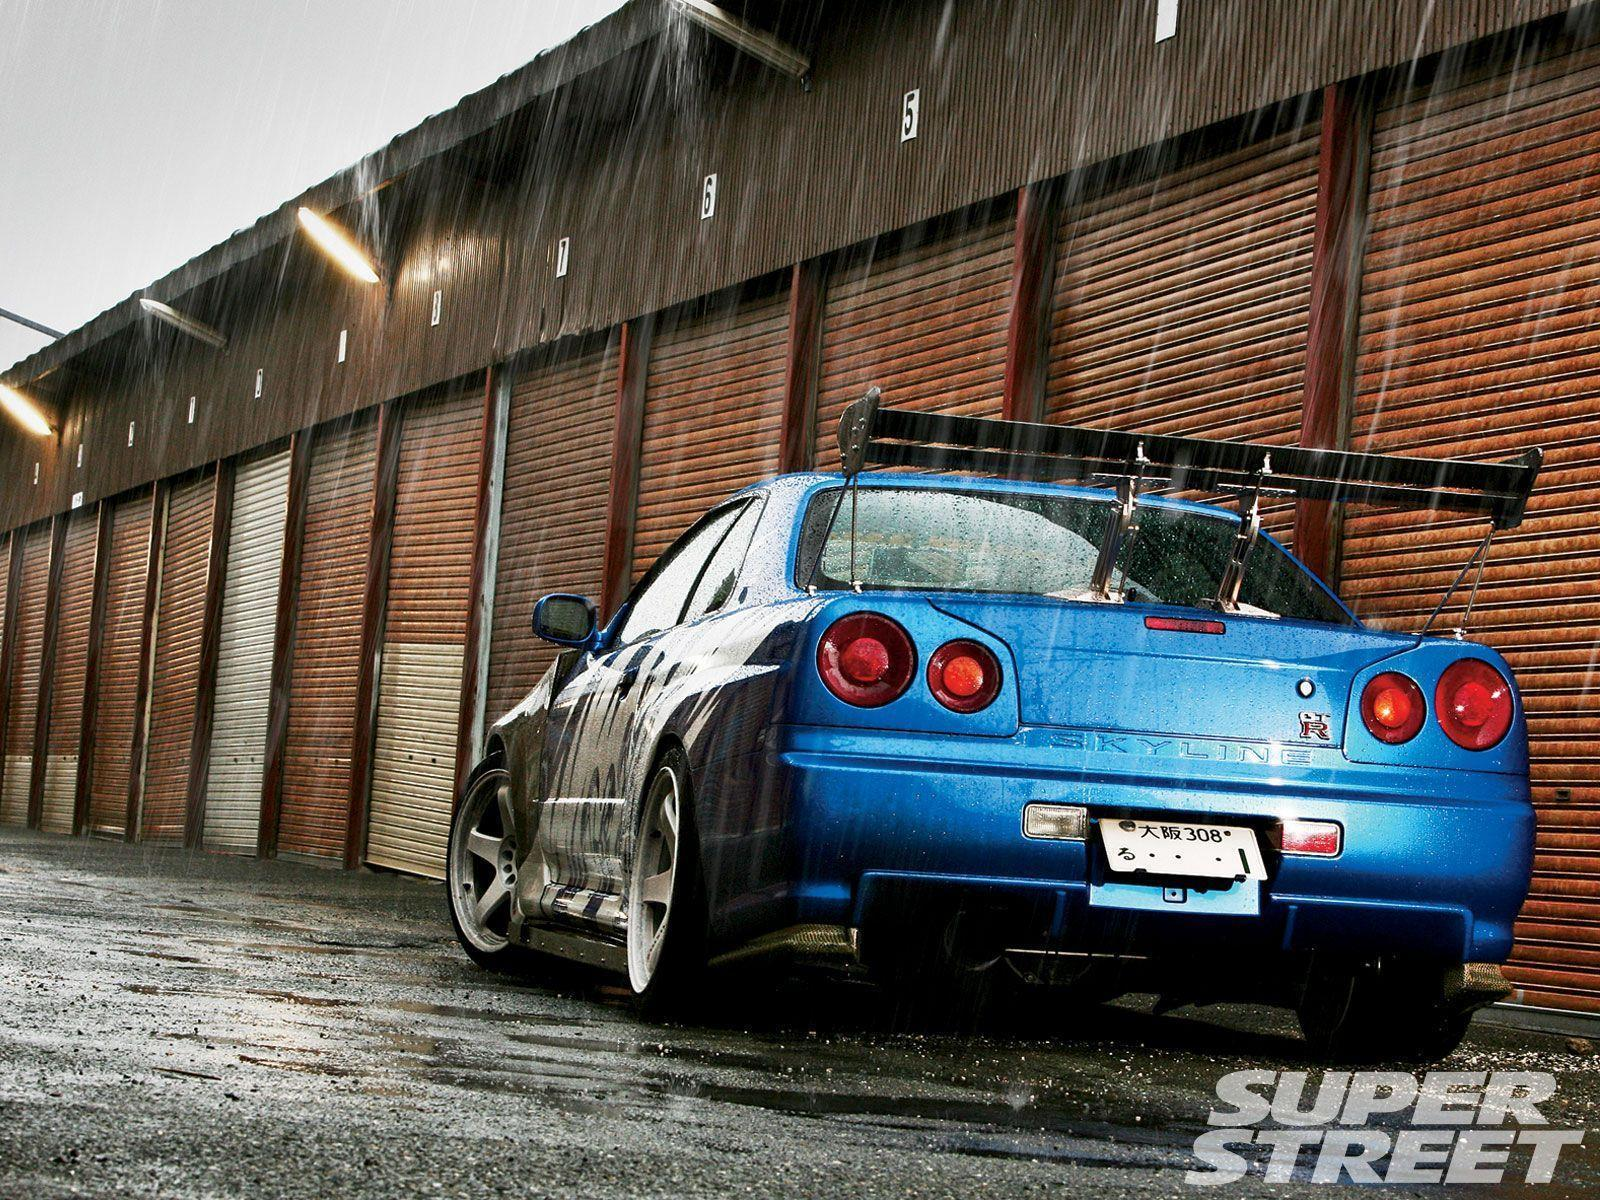 Nissan Skyline Wallpapers Top Free Nissan Skyline Backgrounds